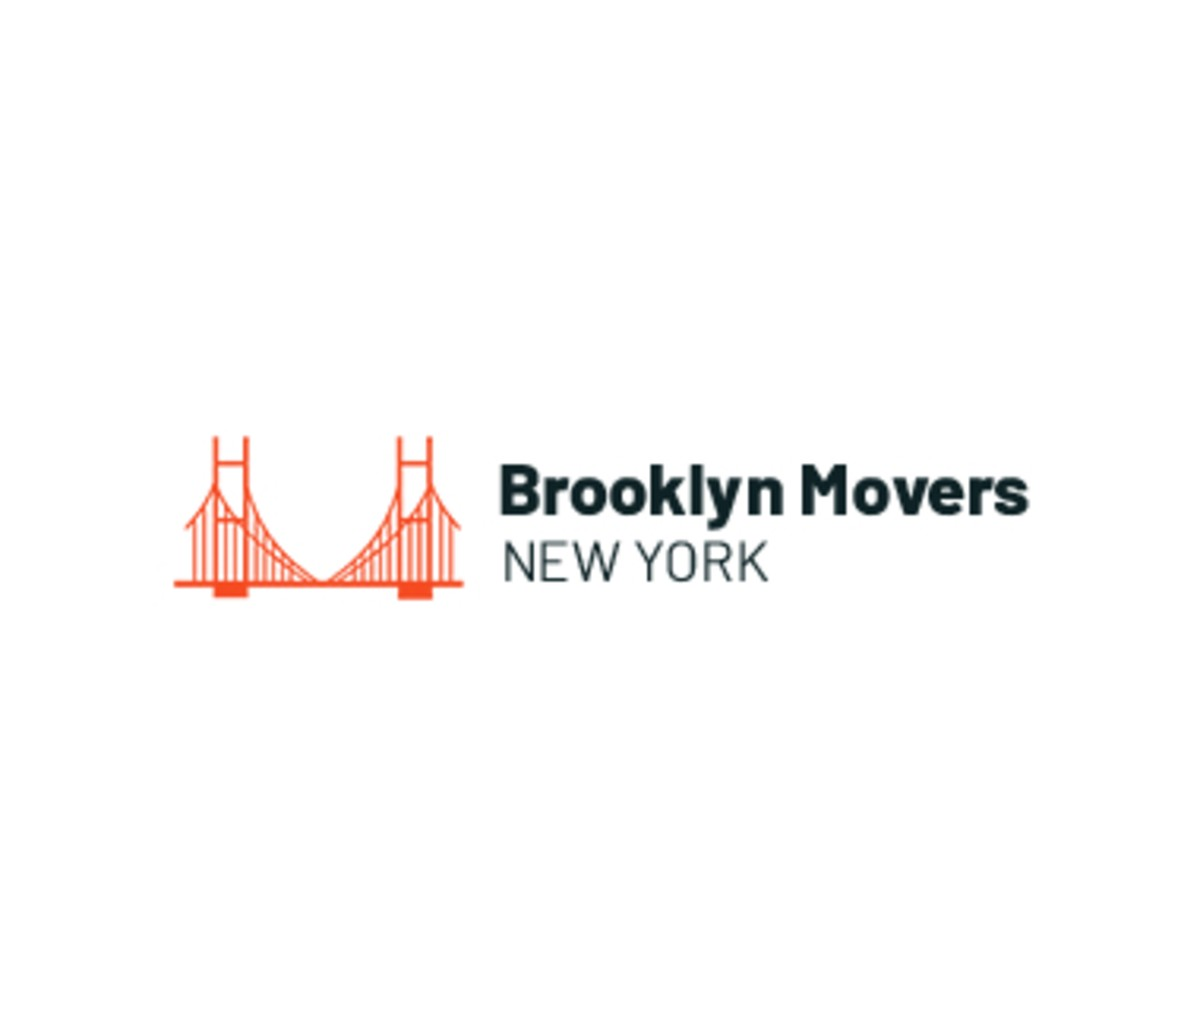 Brooklyn Movers New York - Logo 1200x1000.jpg